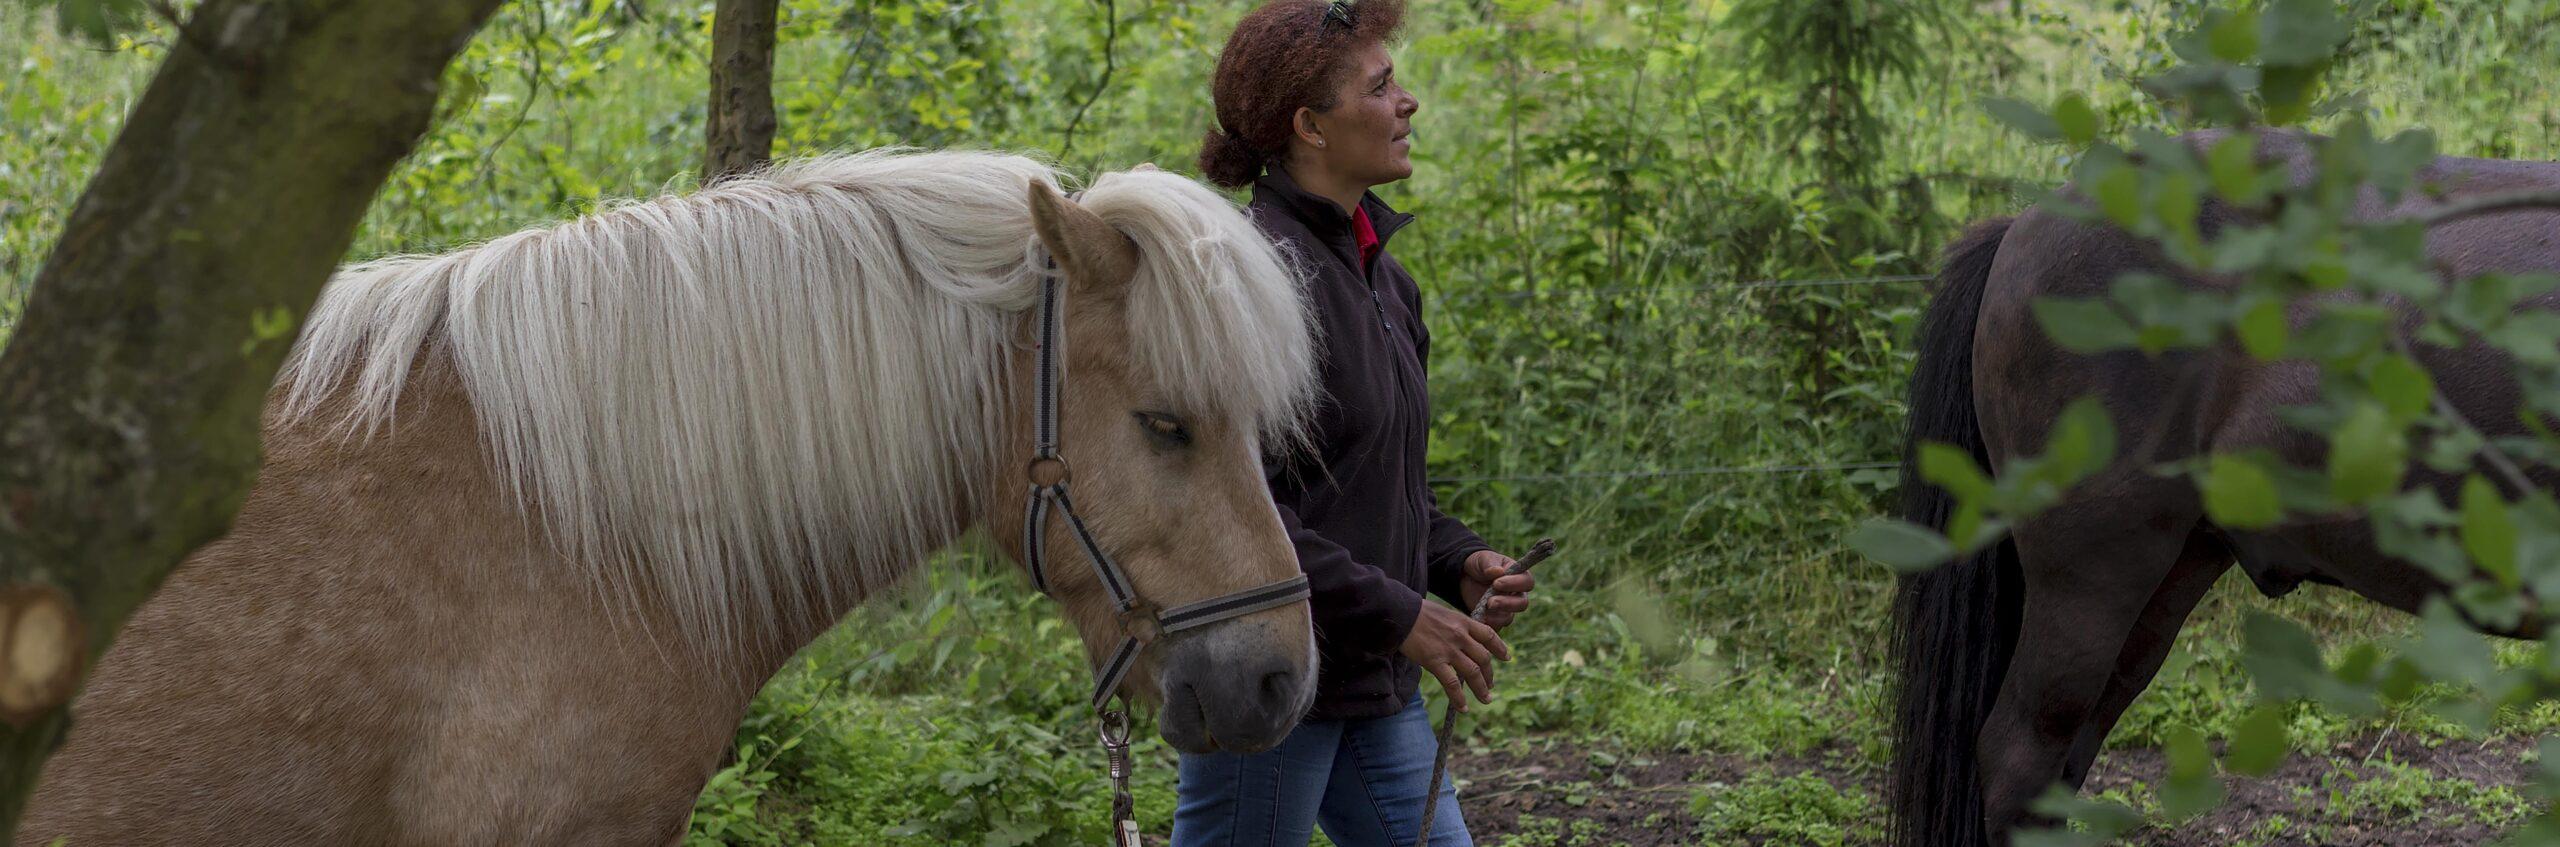 Rideterapeut i Røsnæs skove hos skolen for rideterapi